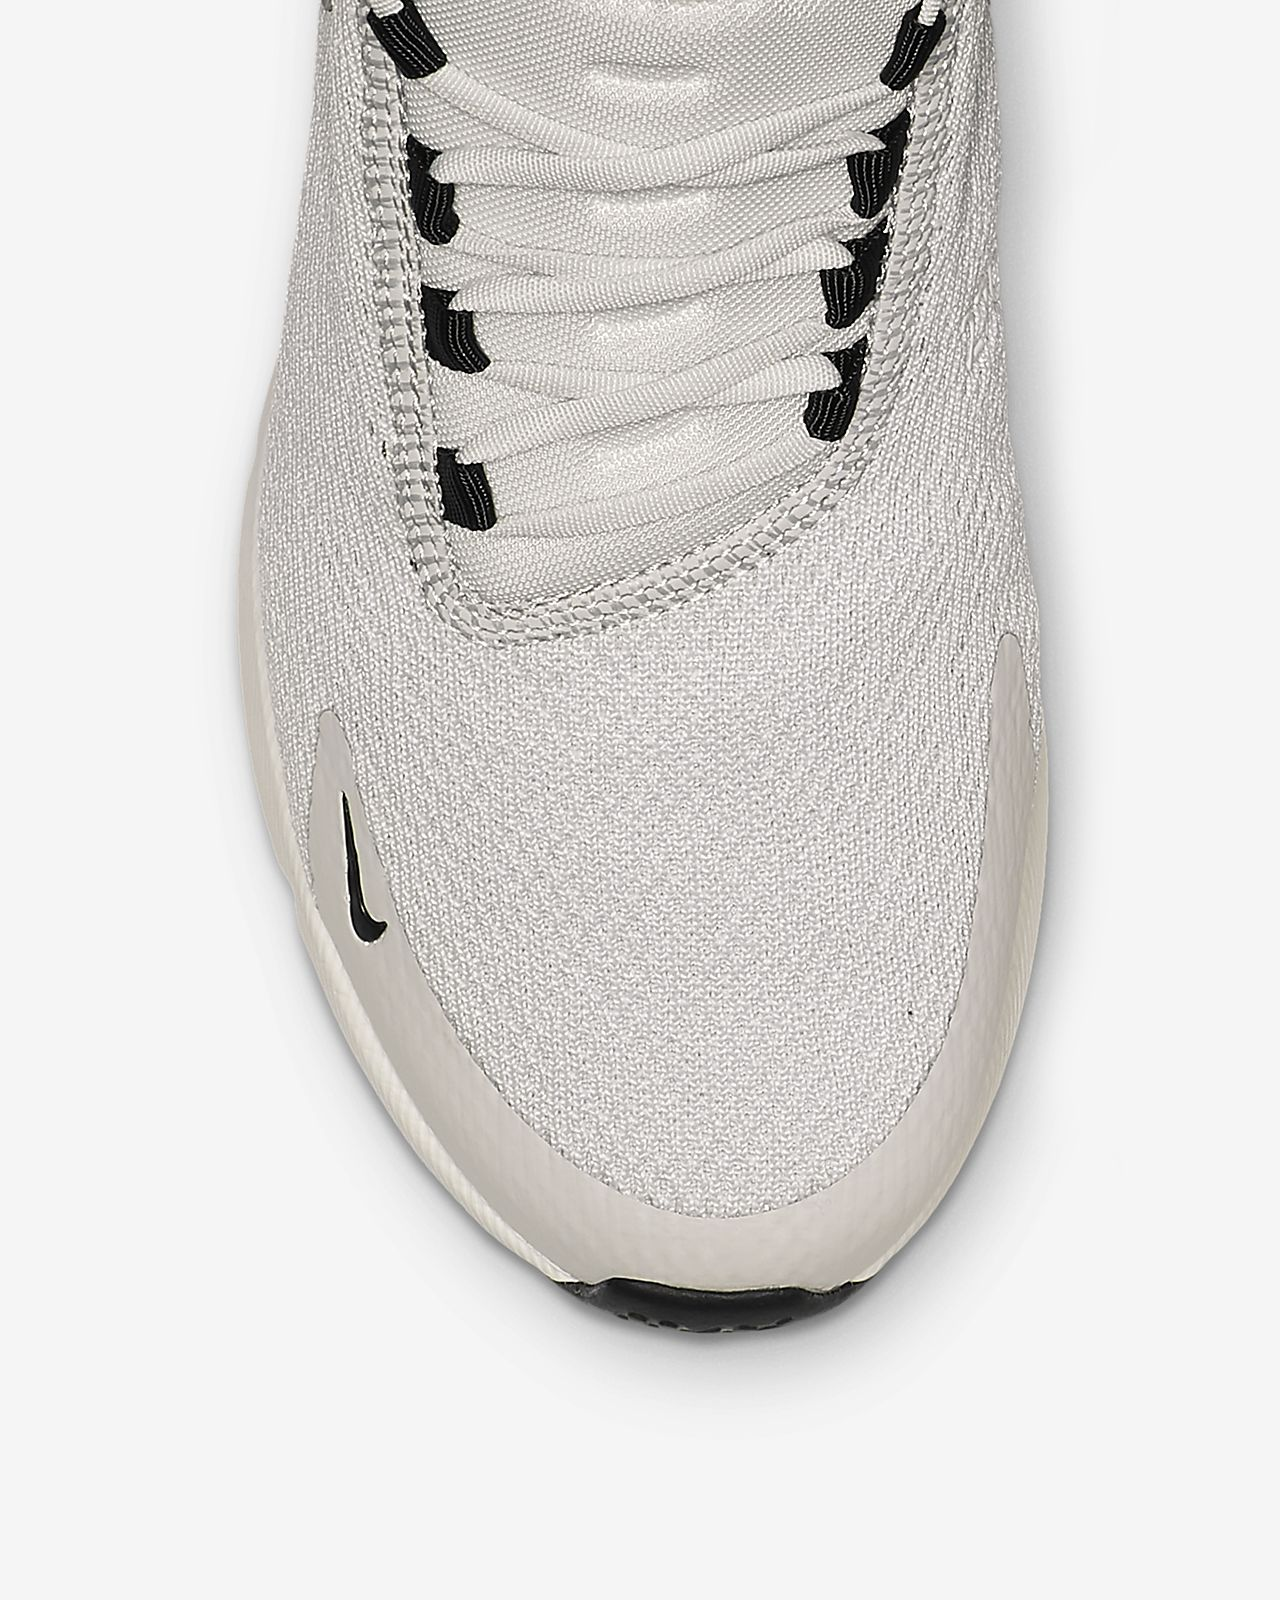 online store f9469 1baad ... Nike Air Max 270 Damenschuh